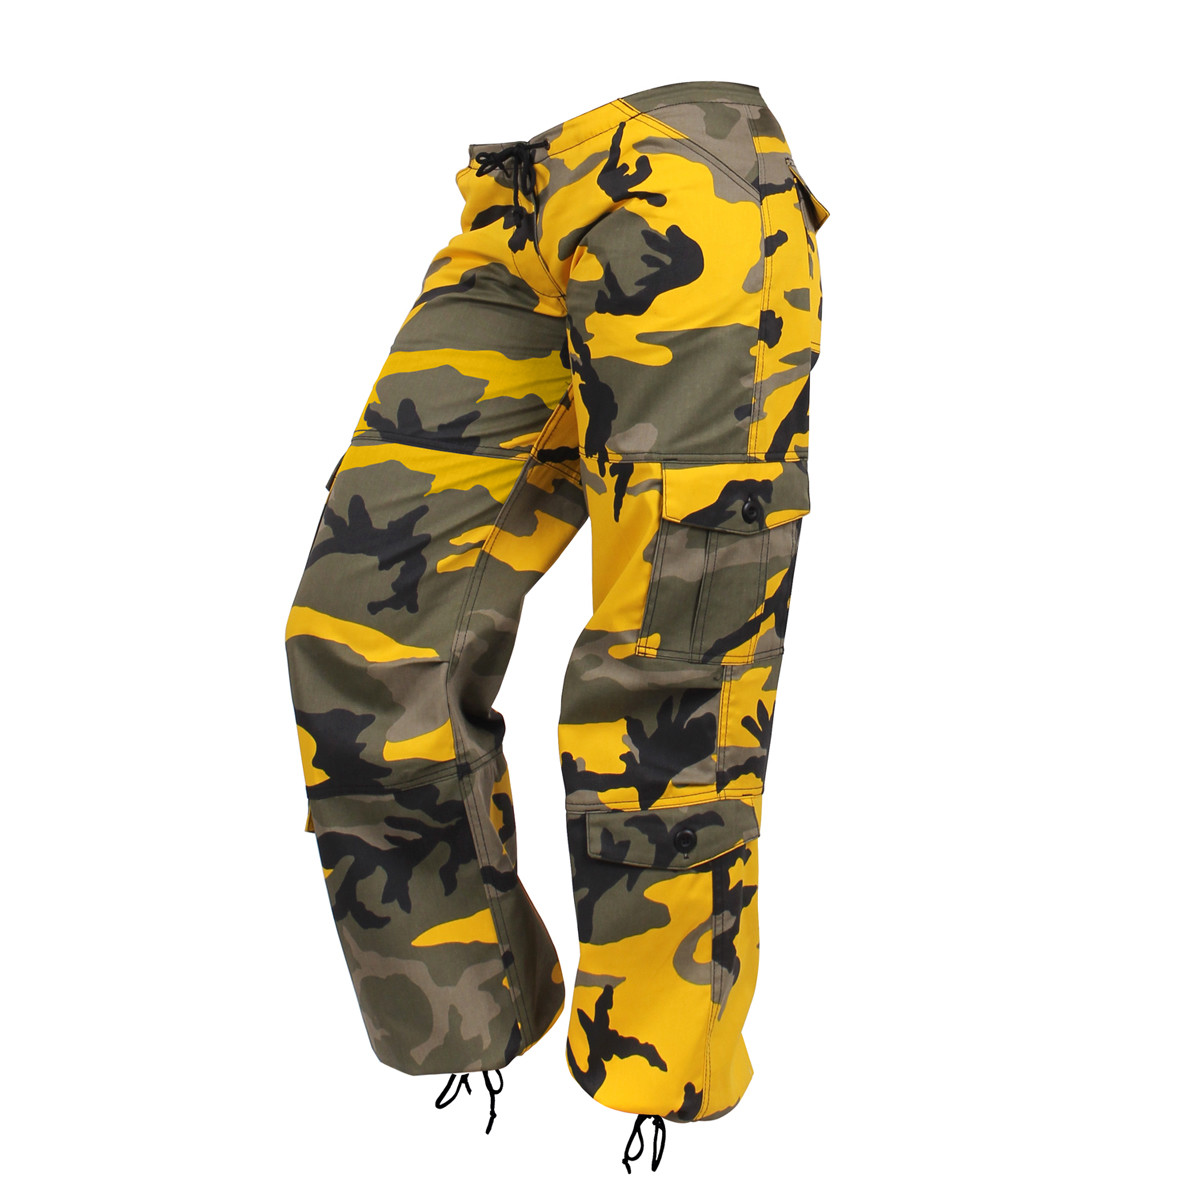 Shop Womens Yellow Camo Fatigue Pants - Fatigues Army Navy Gear 8f214b7de8